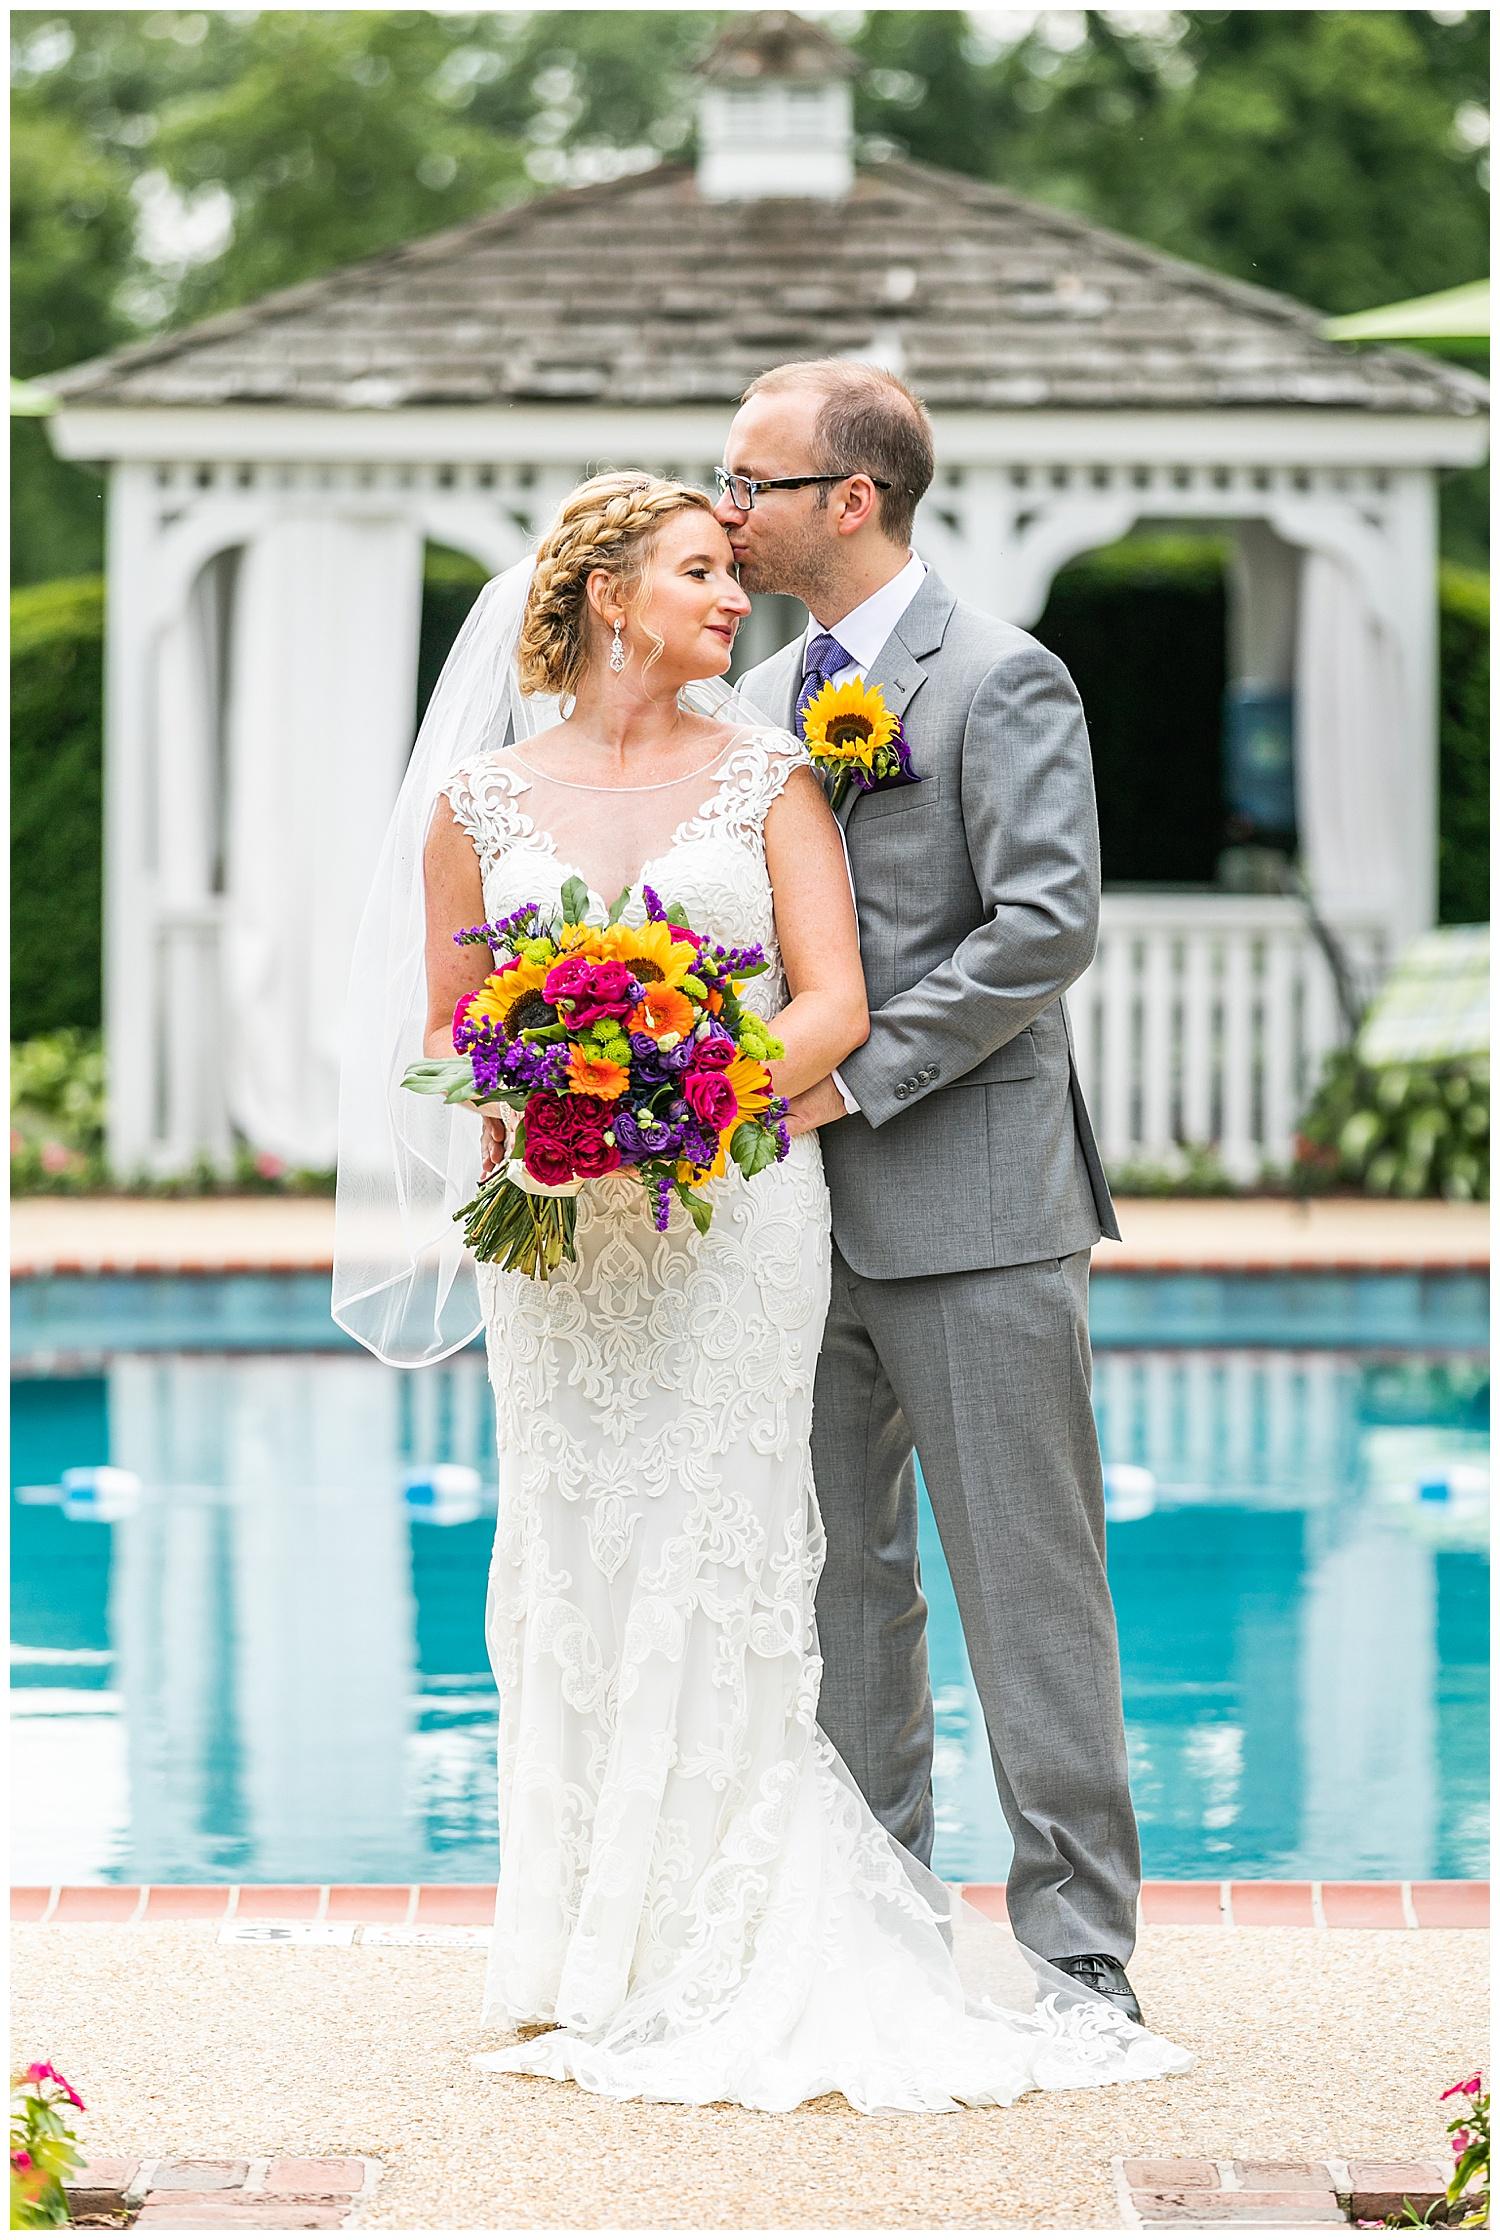 Michelle Shaun Antrim 1844 Wedding Living Radiant Photography photos_0058.jpg